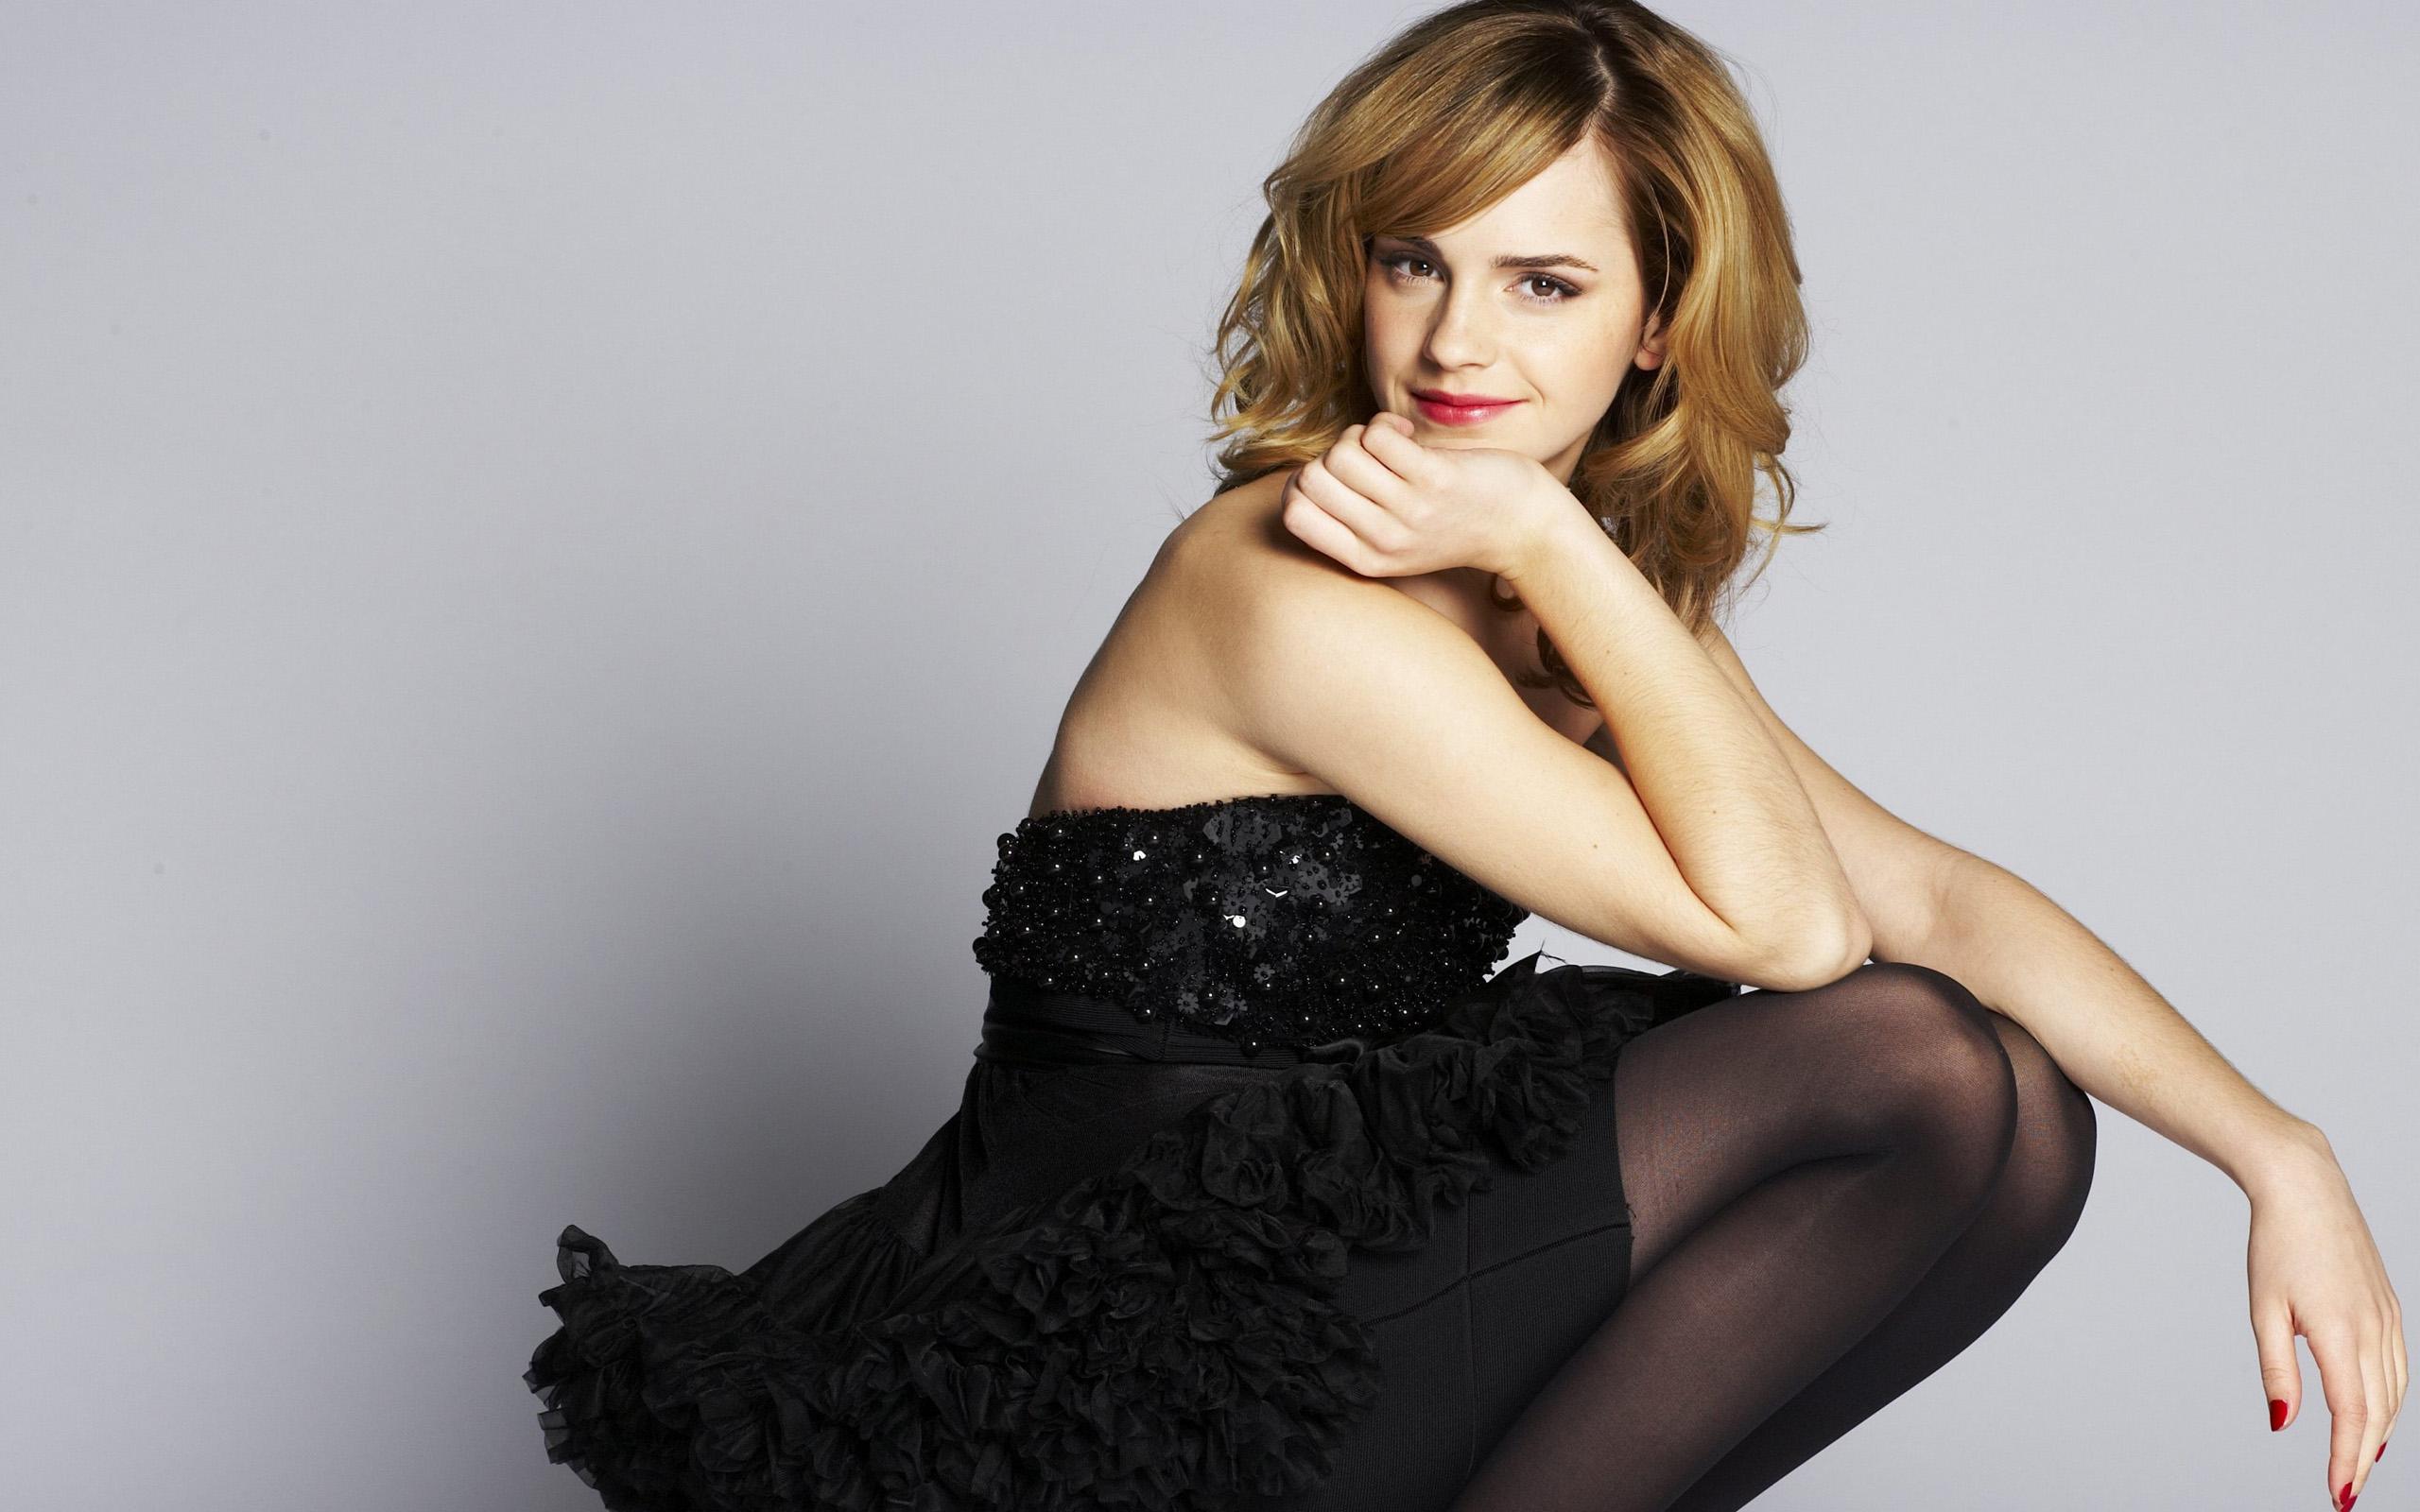 Emma Watsons New Wallpapers HD Wallpapers 2560x1600